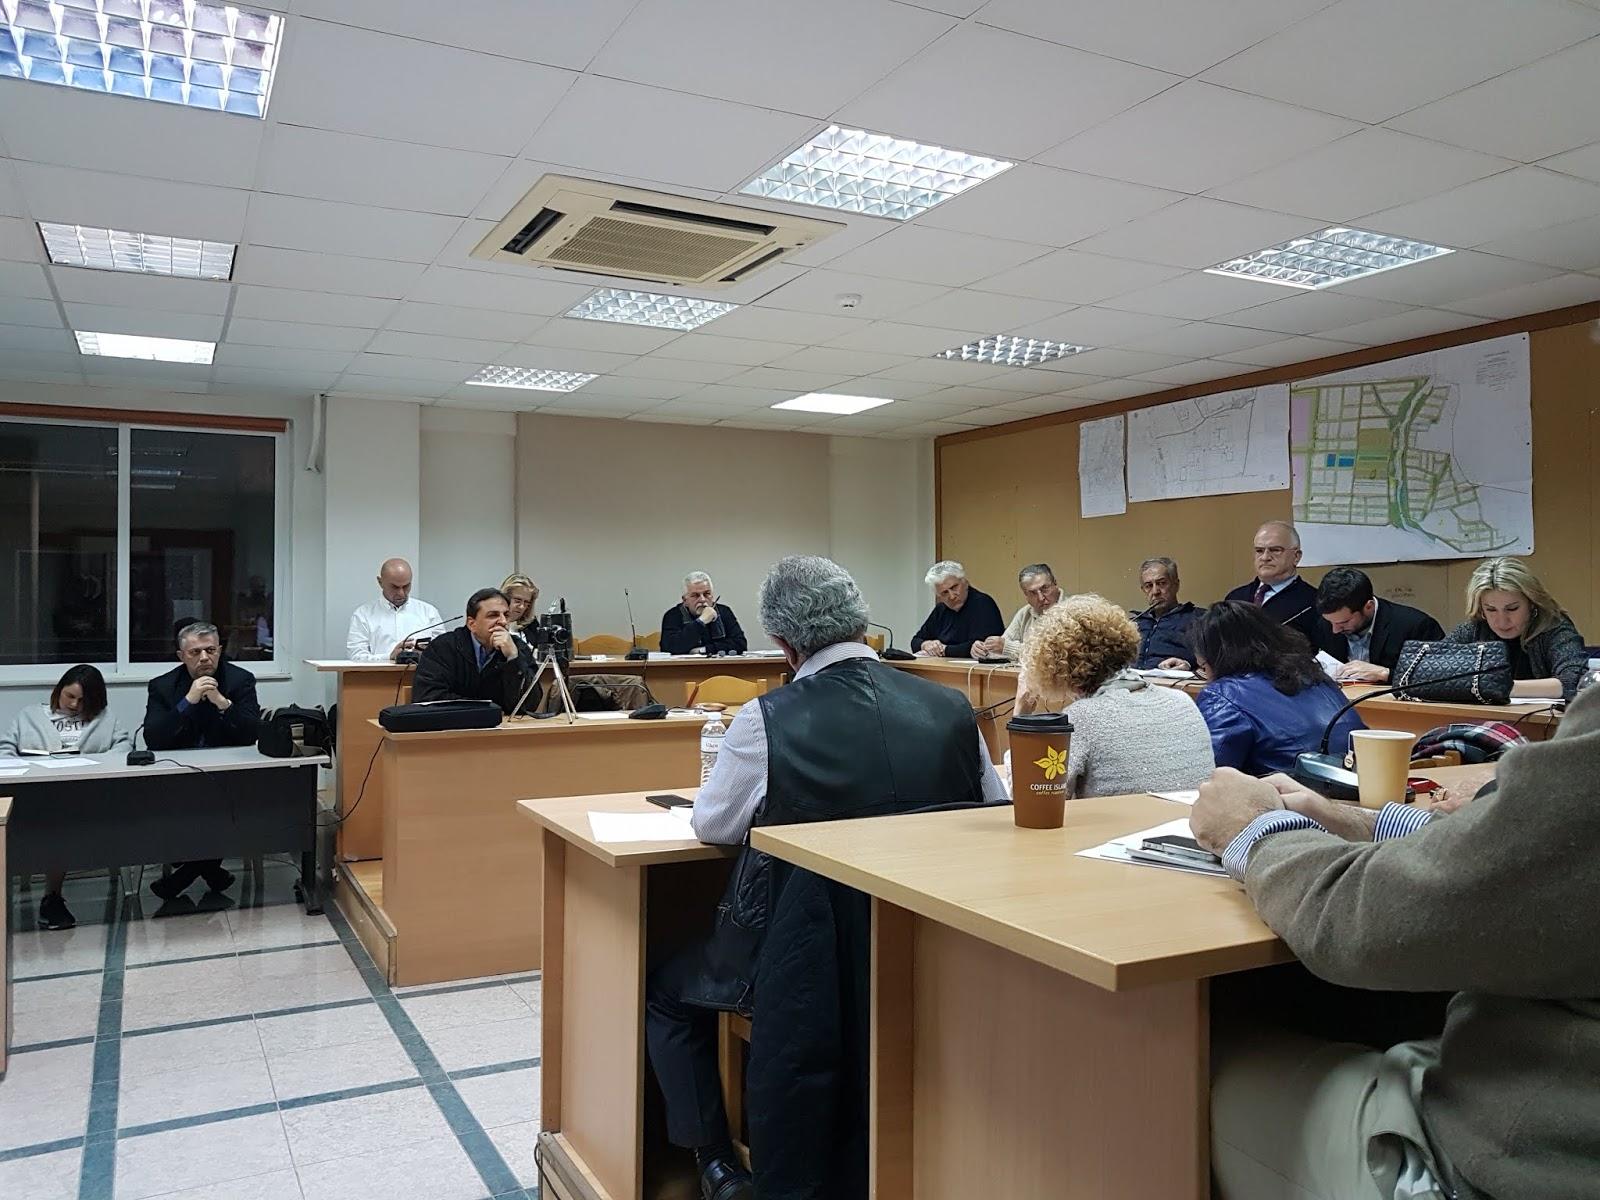 3464952701e Η ενημέρωση του Δήμαρχου Παλλήνης προς το Δημοτικό συμβούλιο για τις φήμες  περί φιλοξενίας προσφύγων